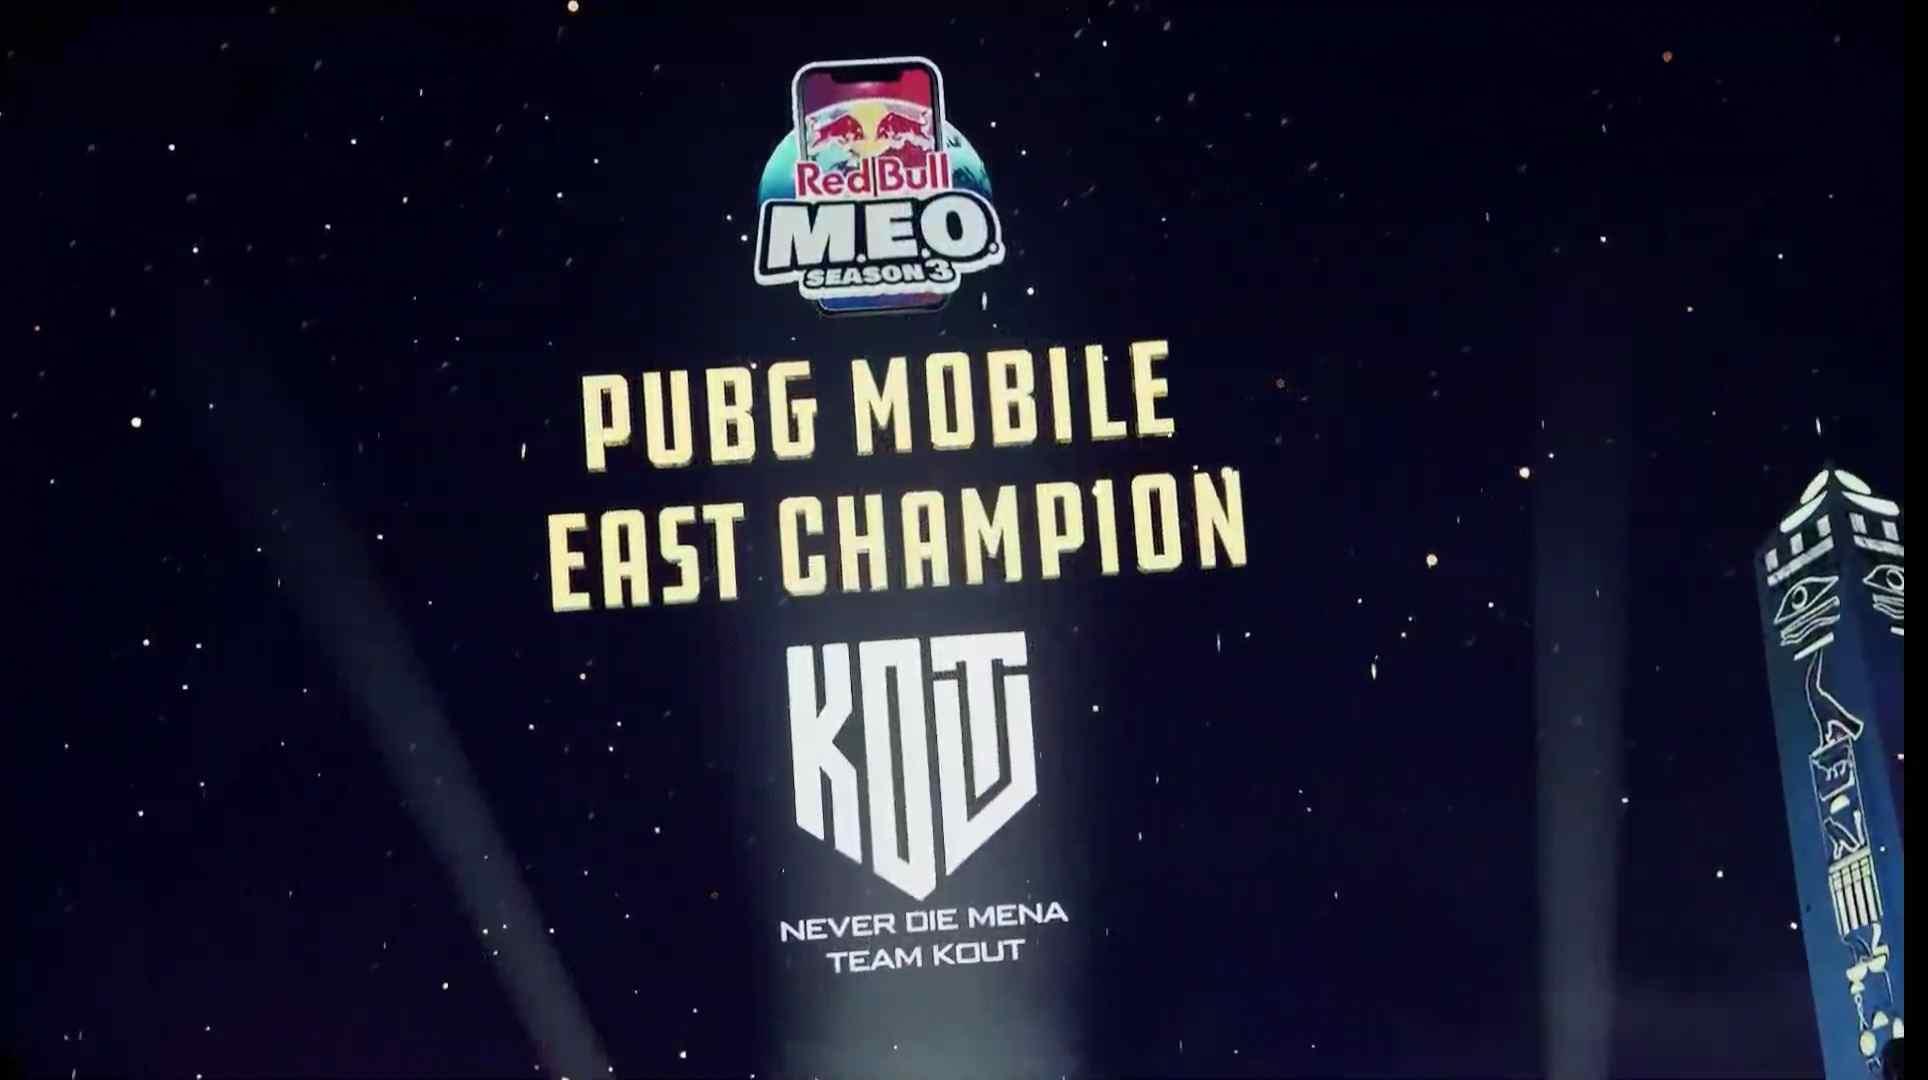 Red Bull M.E.O. Season 3